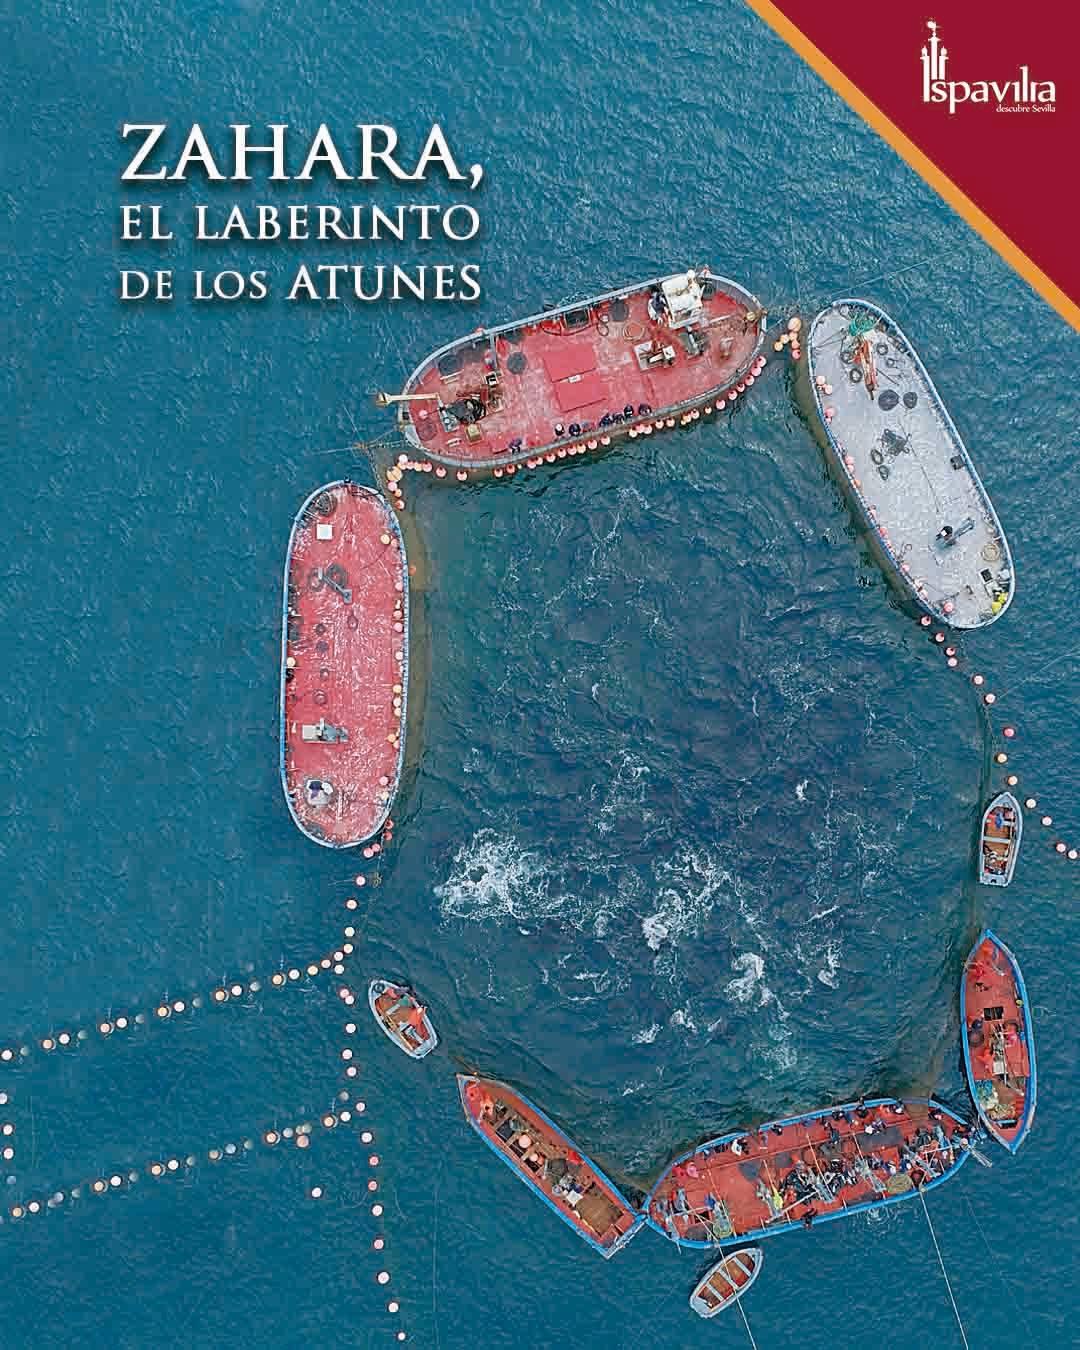 Ruta Cultural 'Zahara: el laberinto de los atunes'